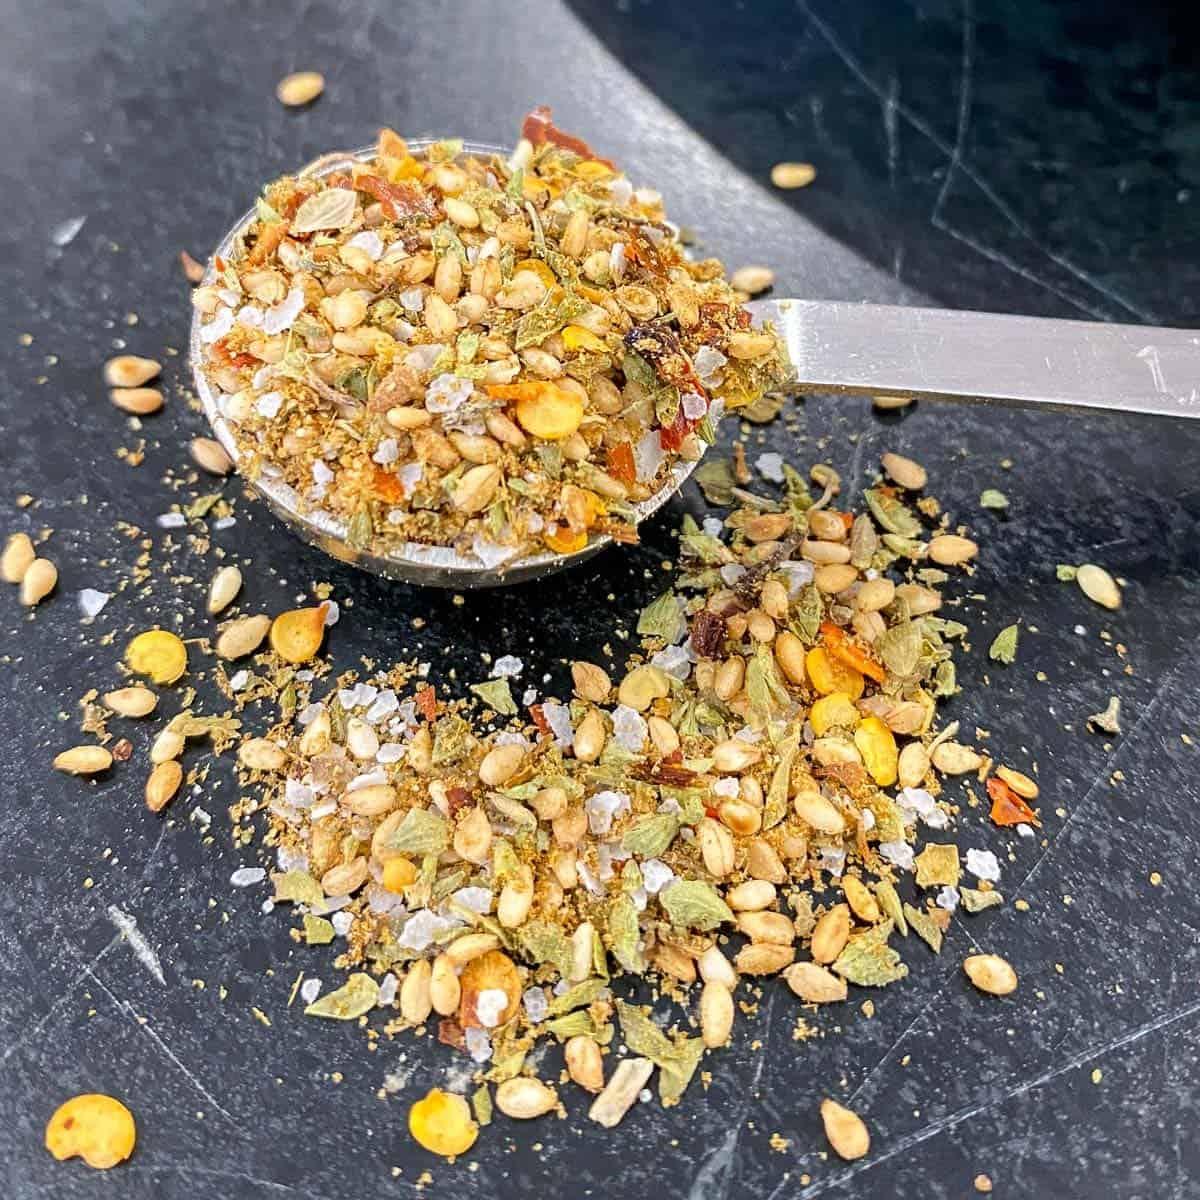 mediterranean seasoning blend recipe in a teaspoon on a black counter top